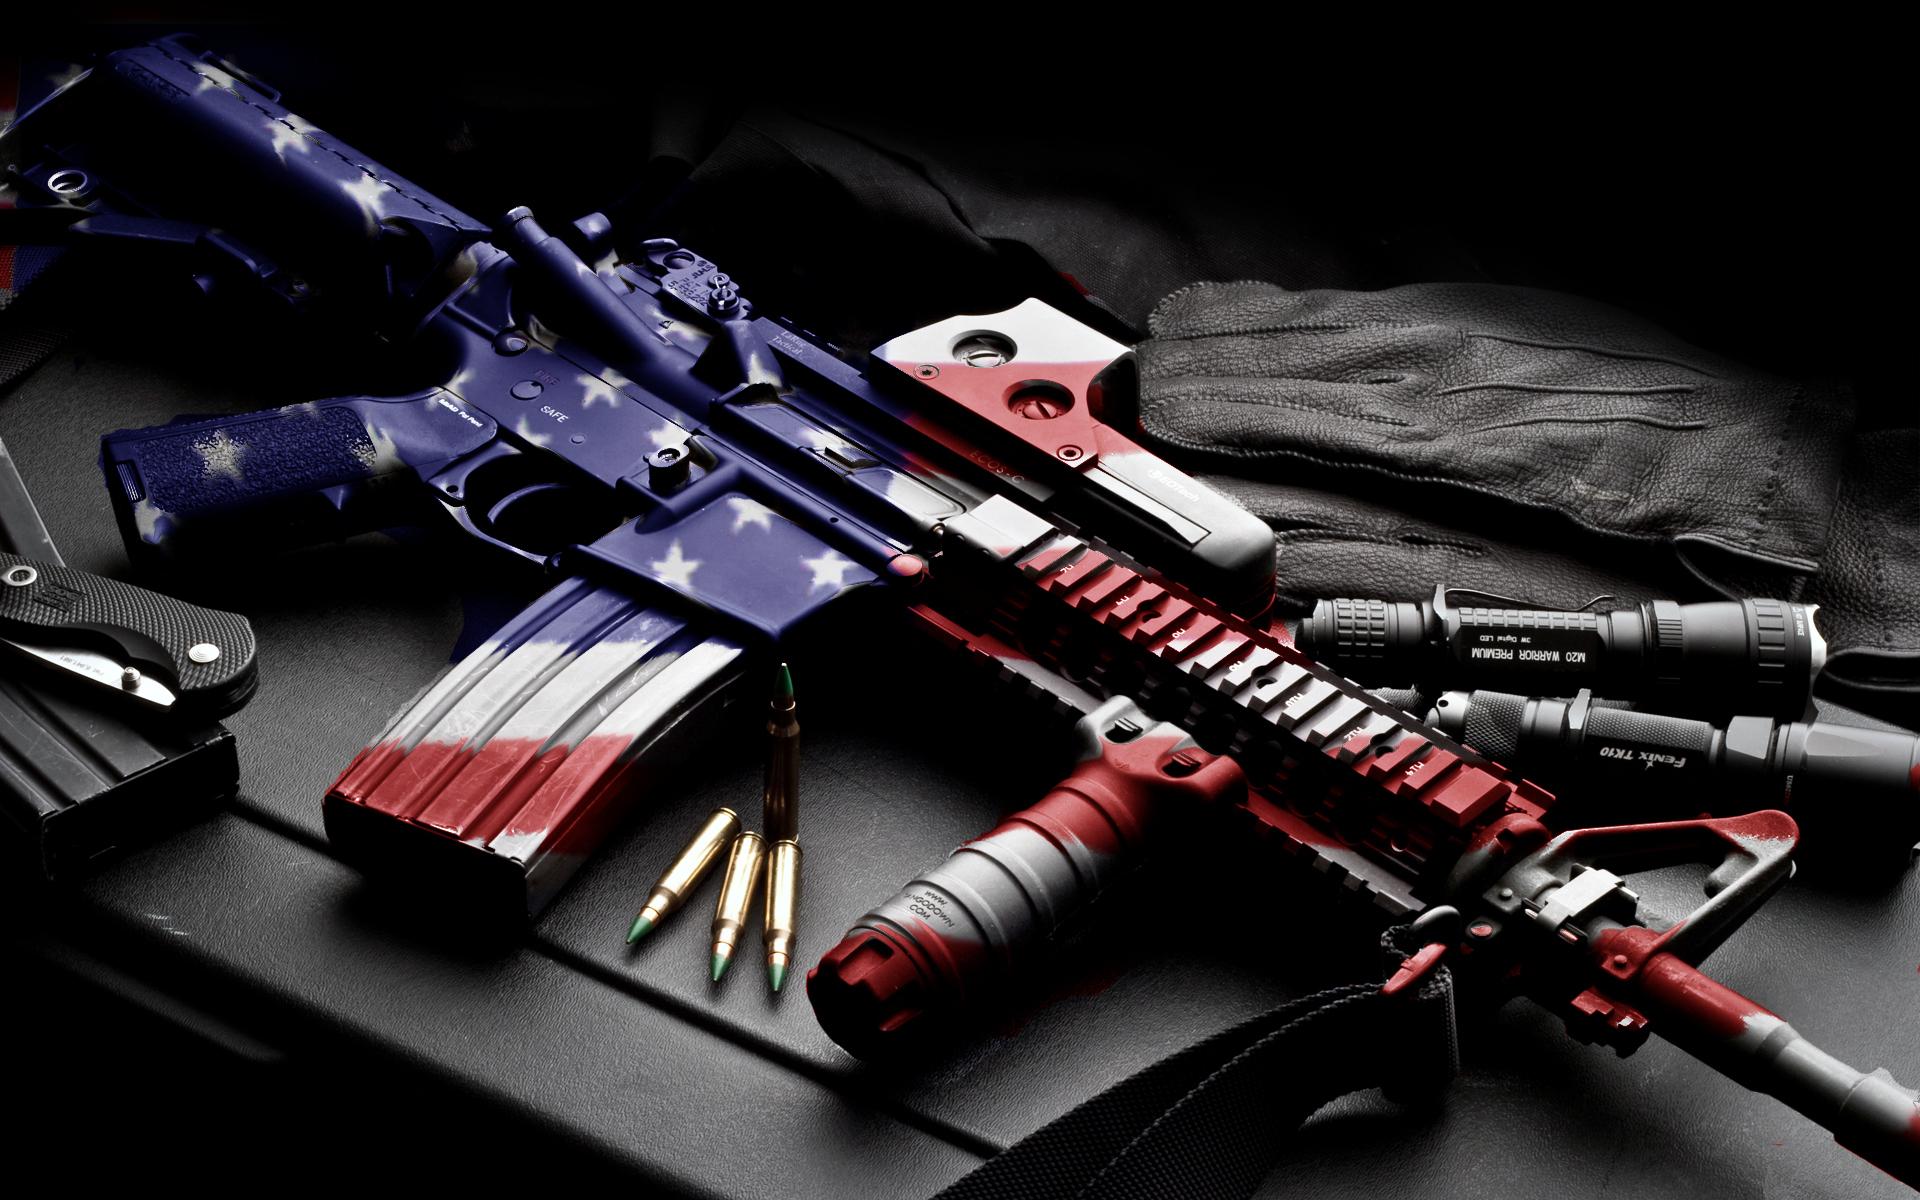 guns mech machine bullet ammo ammuntion flag wallpaper background 1920x1200